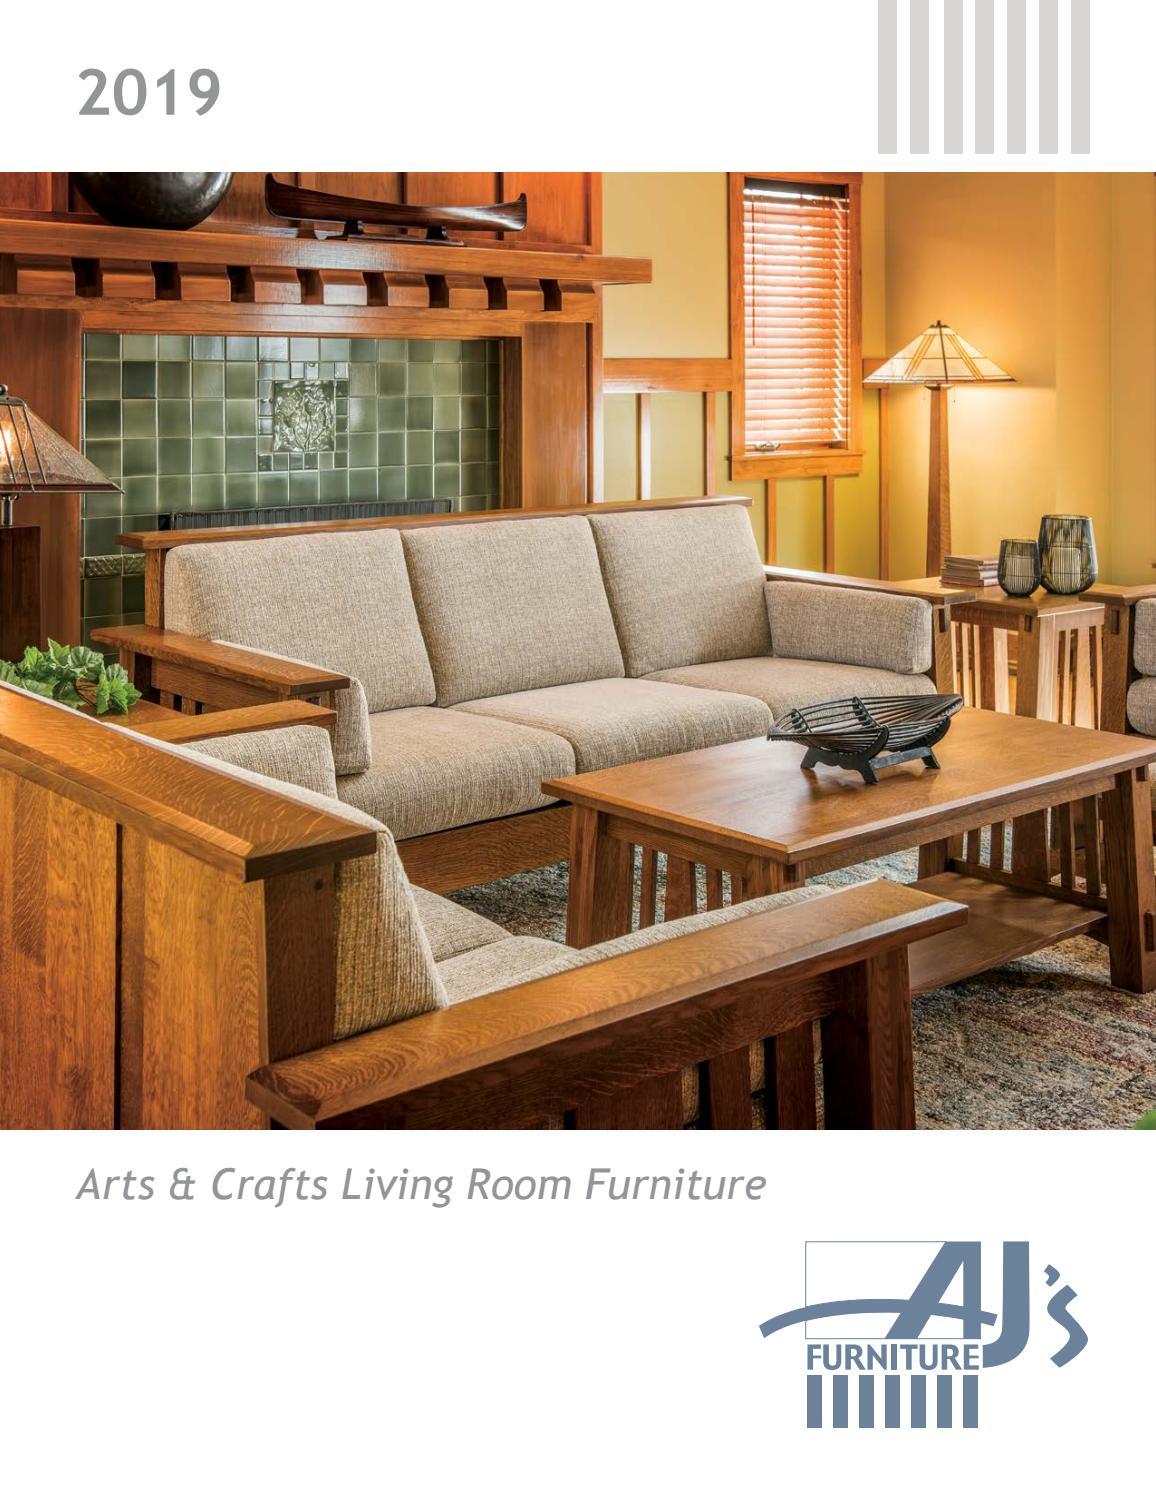 AJ's Furniture 2019 by Heritage Amish Furniture issuu